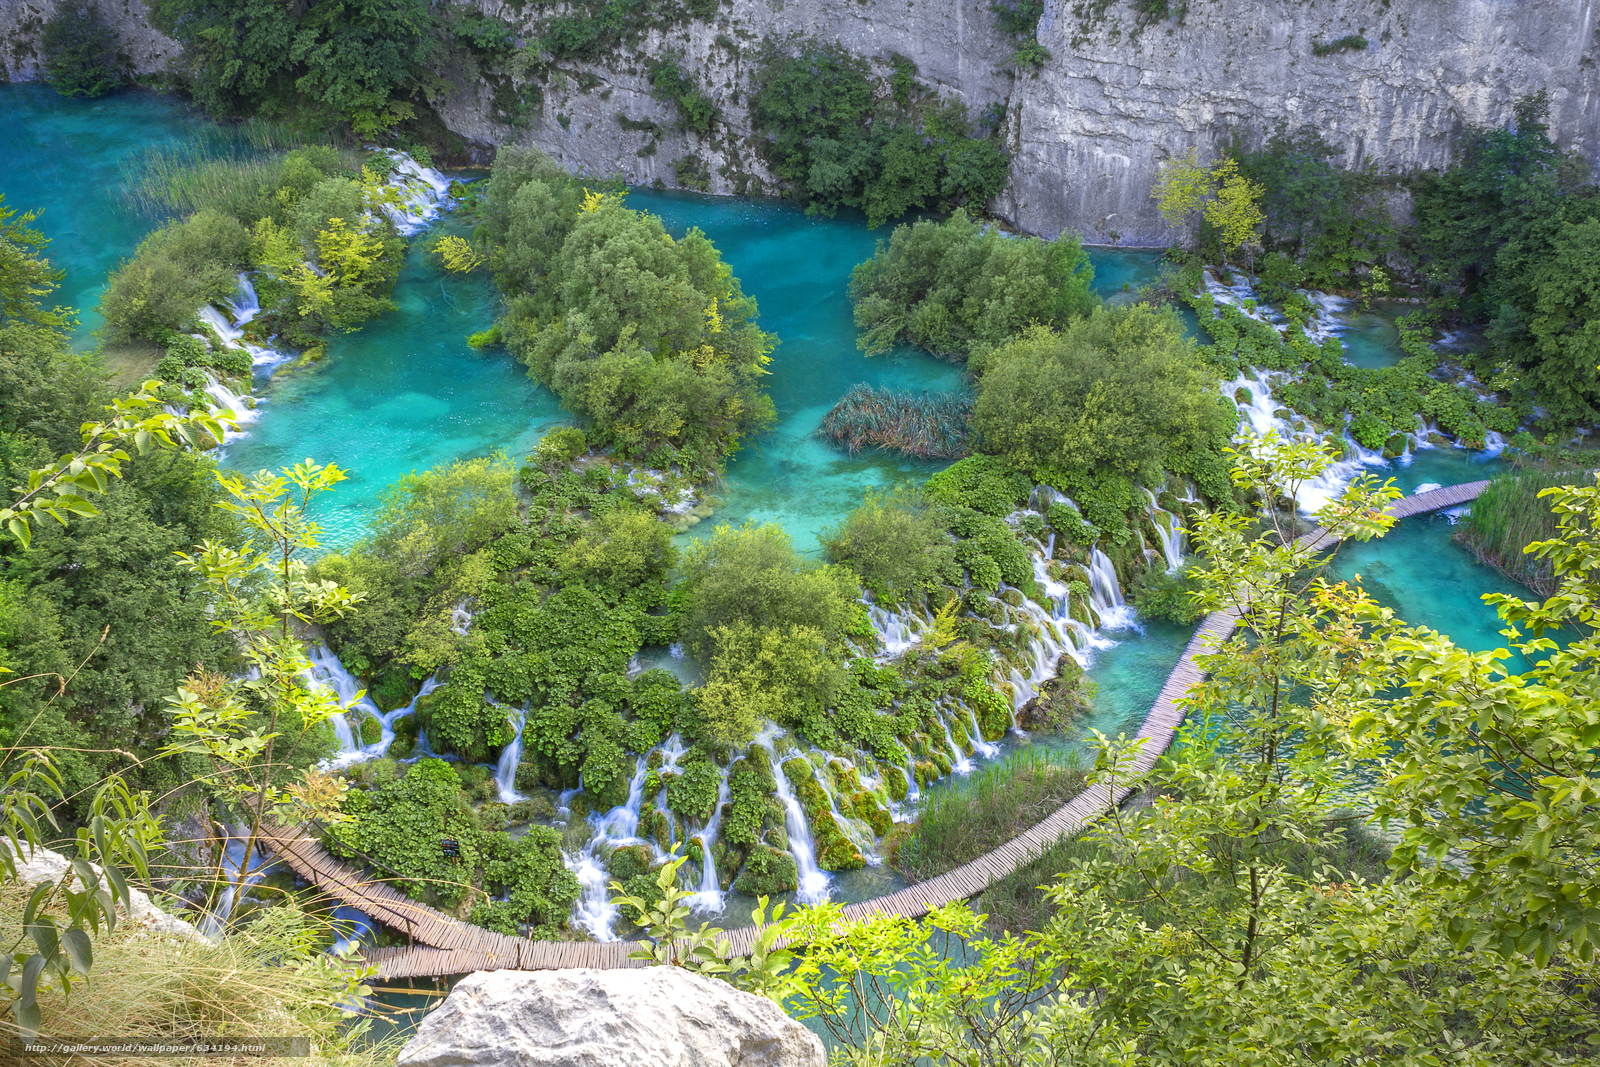 croatia landscape wallpaper - photo #14